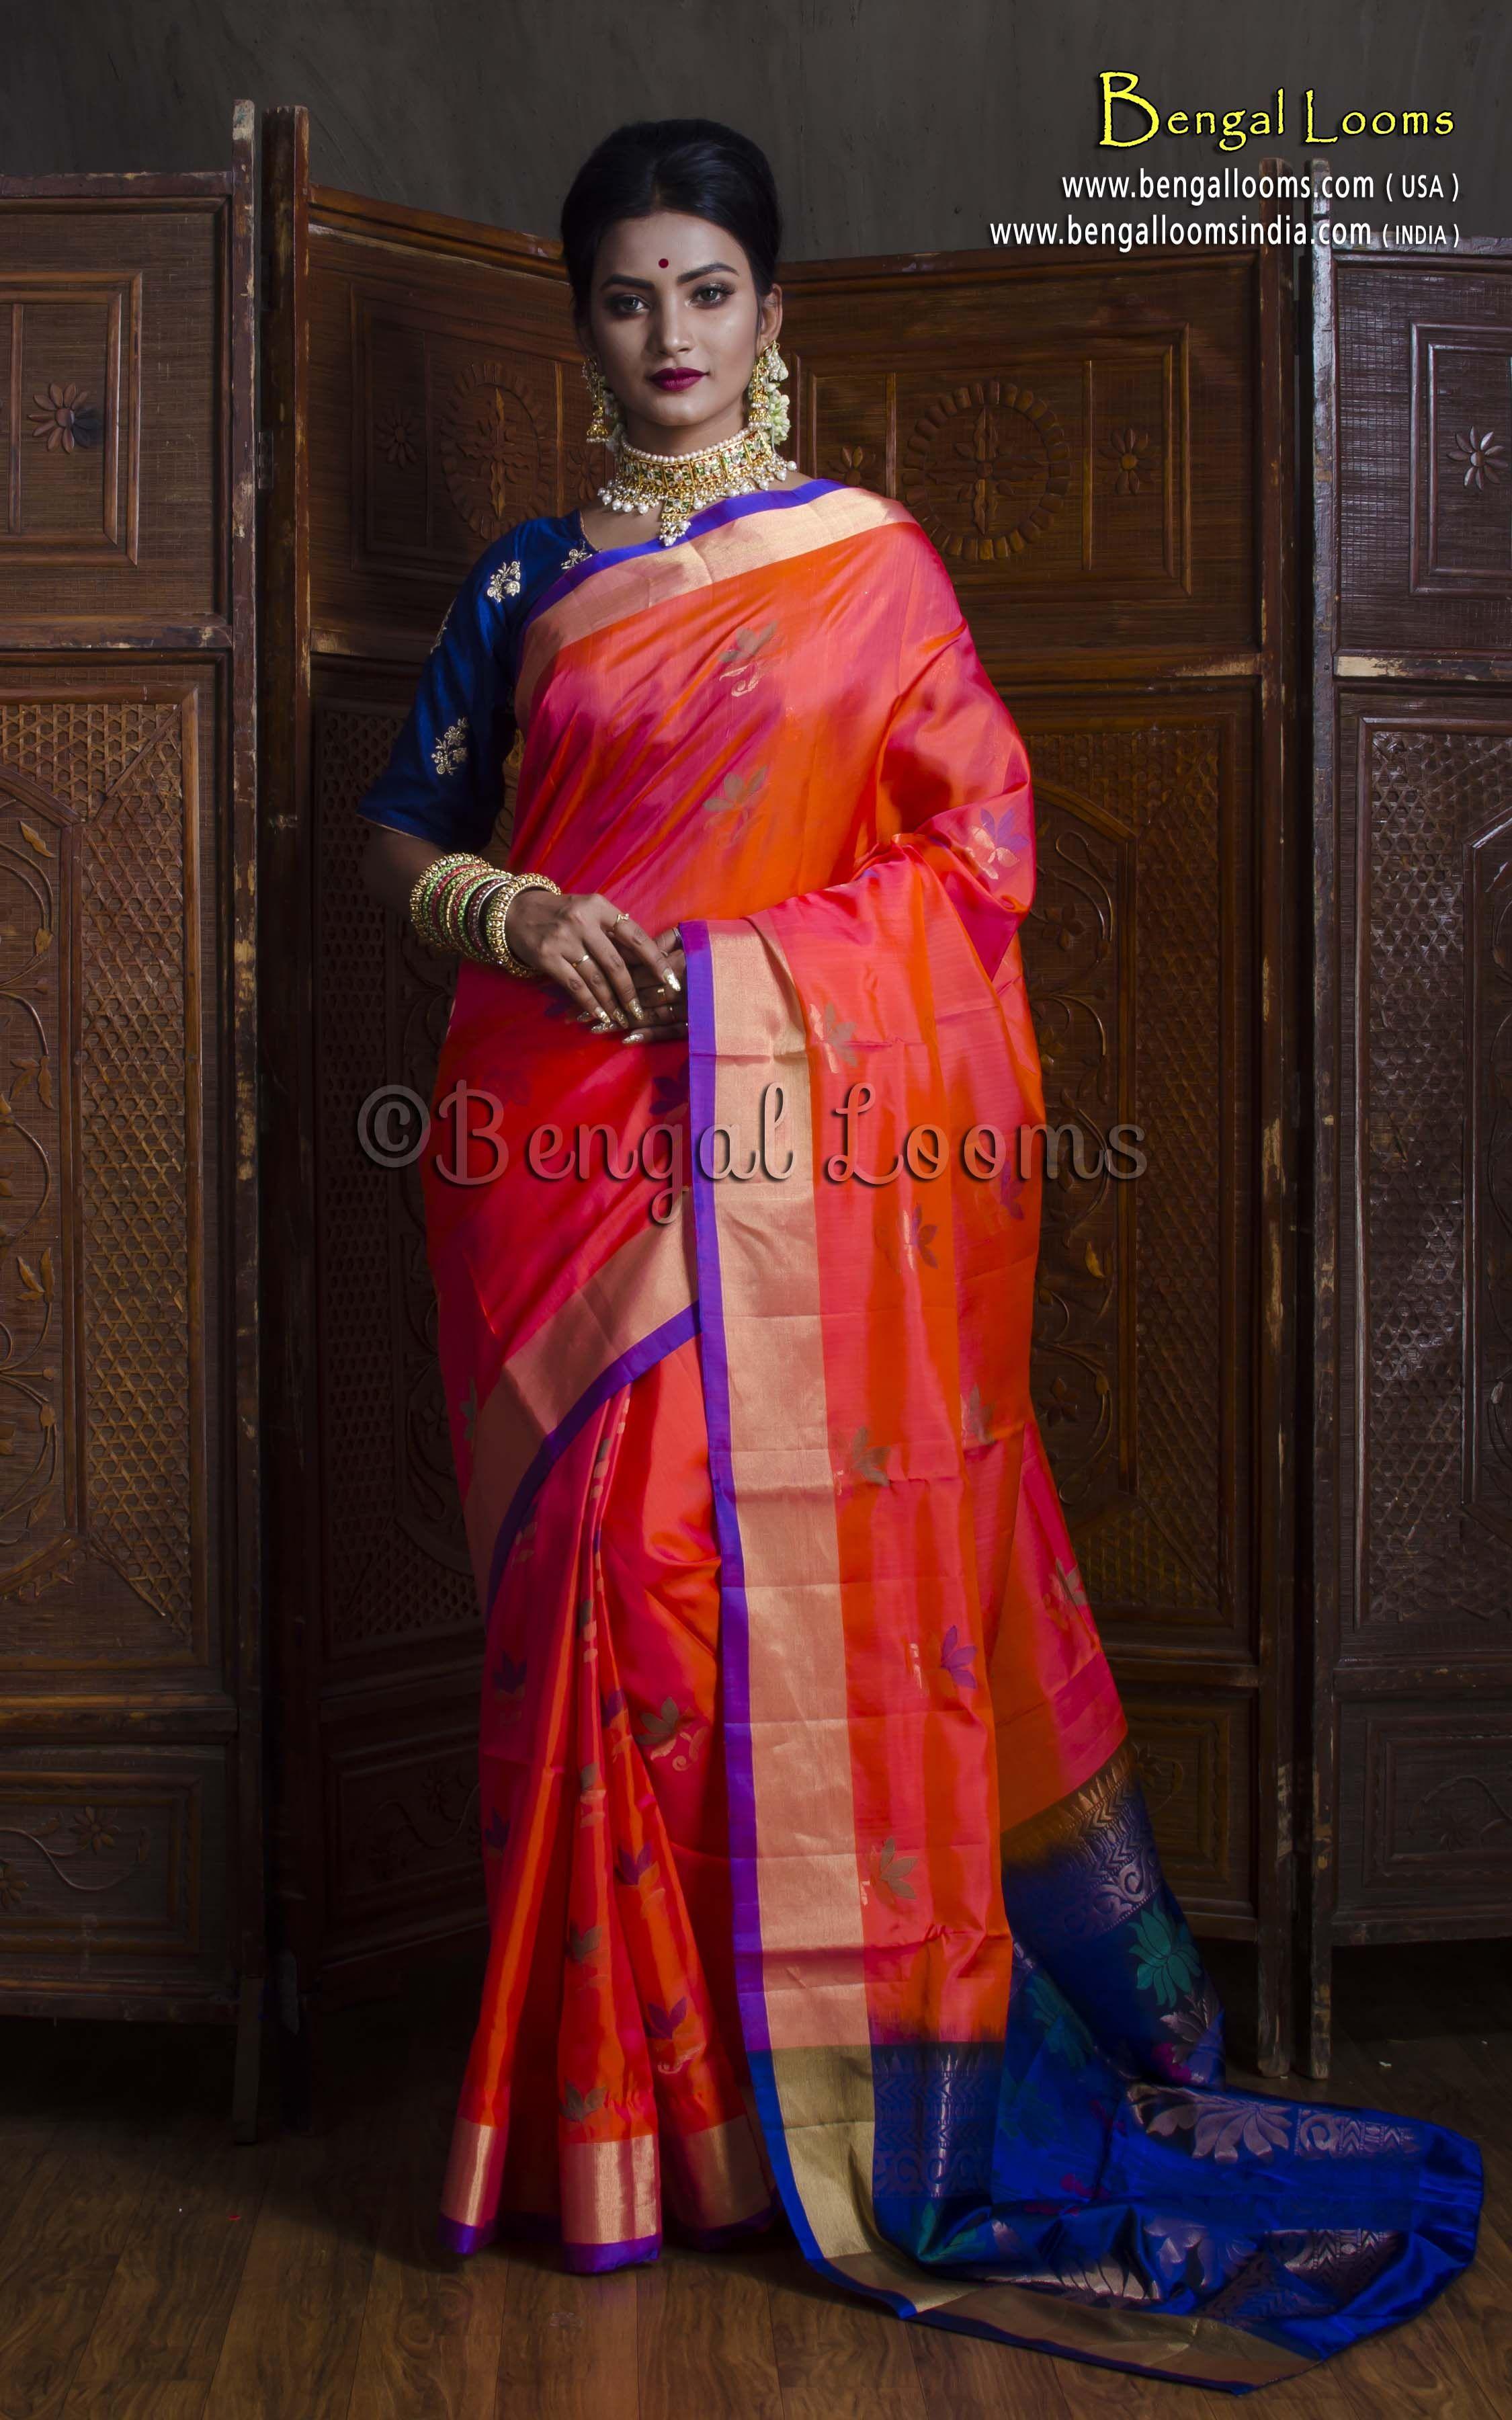 bf09bb5f70bef Pure Pure Handloom Soft Silk Kanchipuram Saree in Peachy Orange and Blue